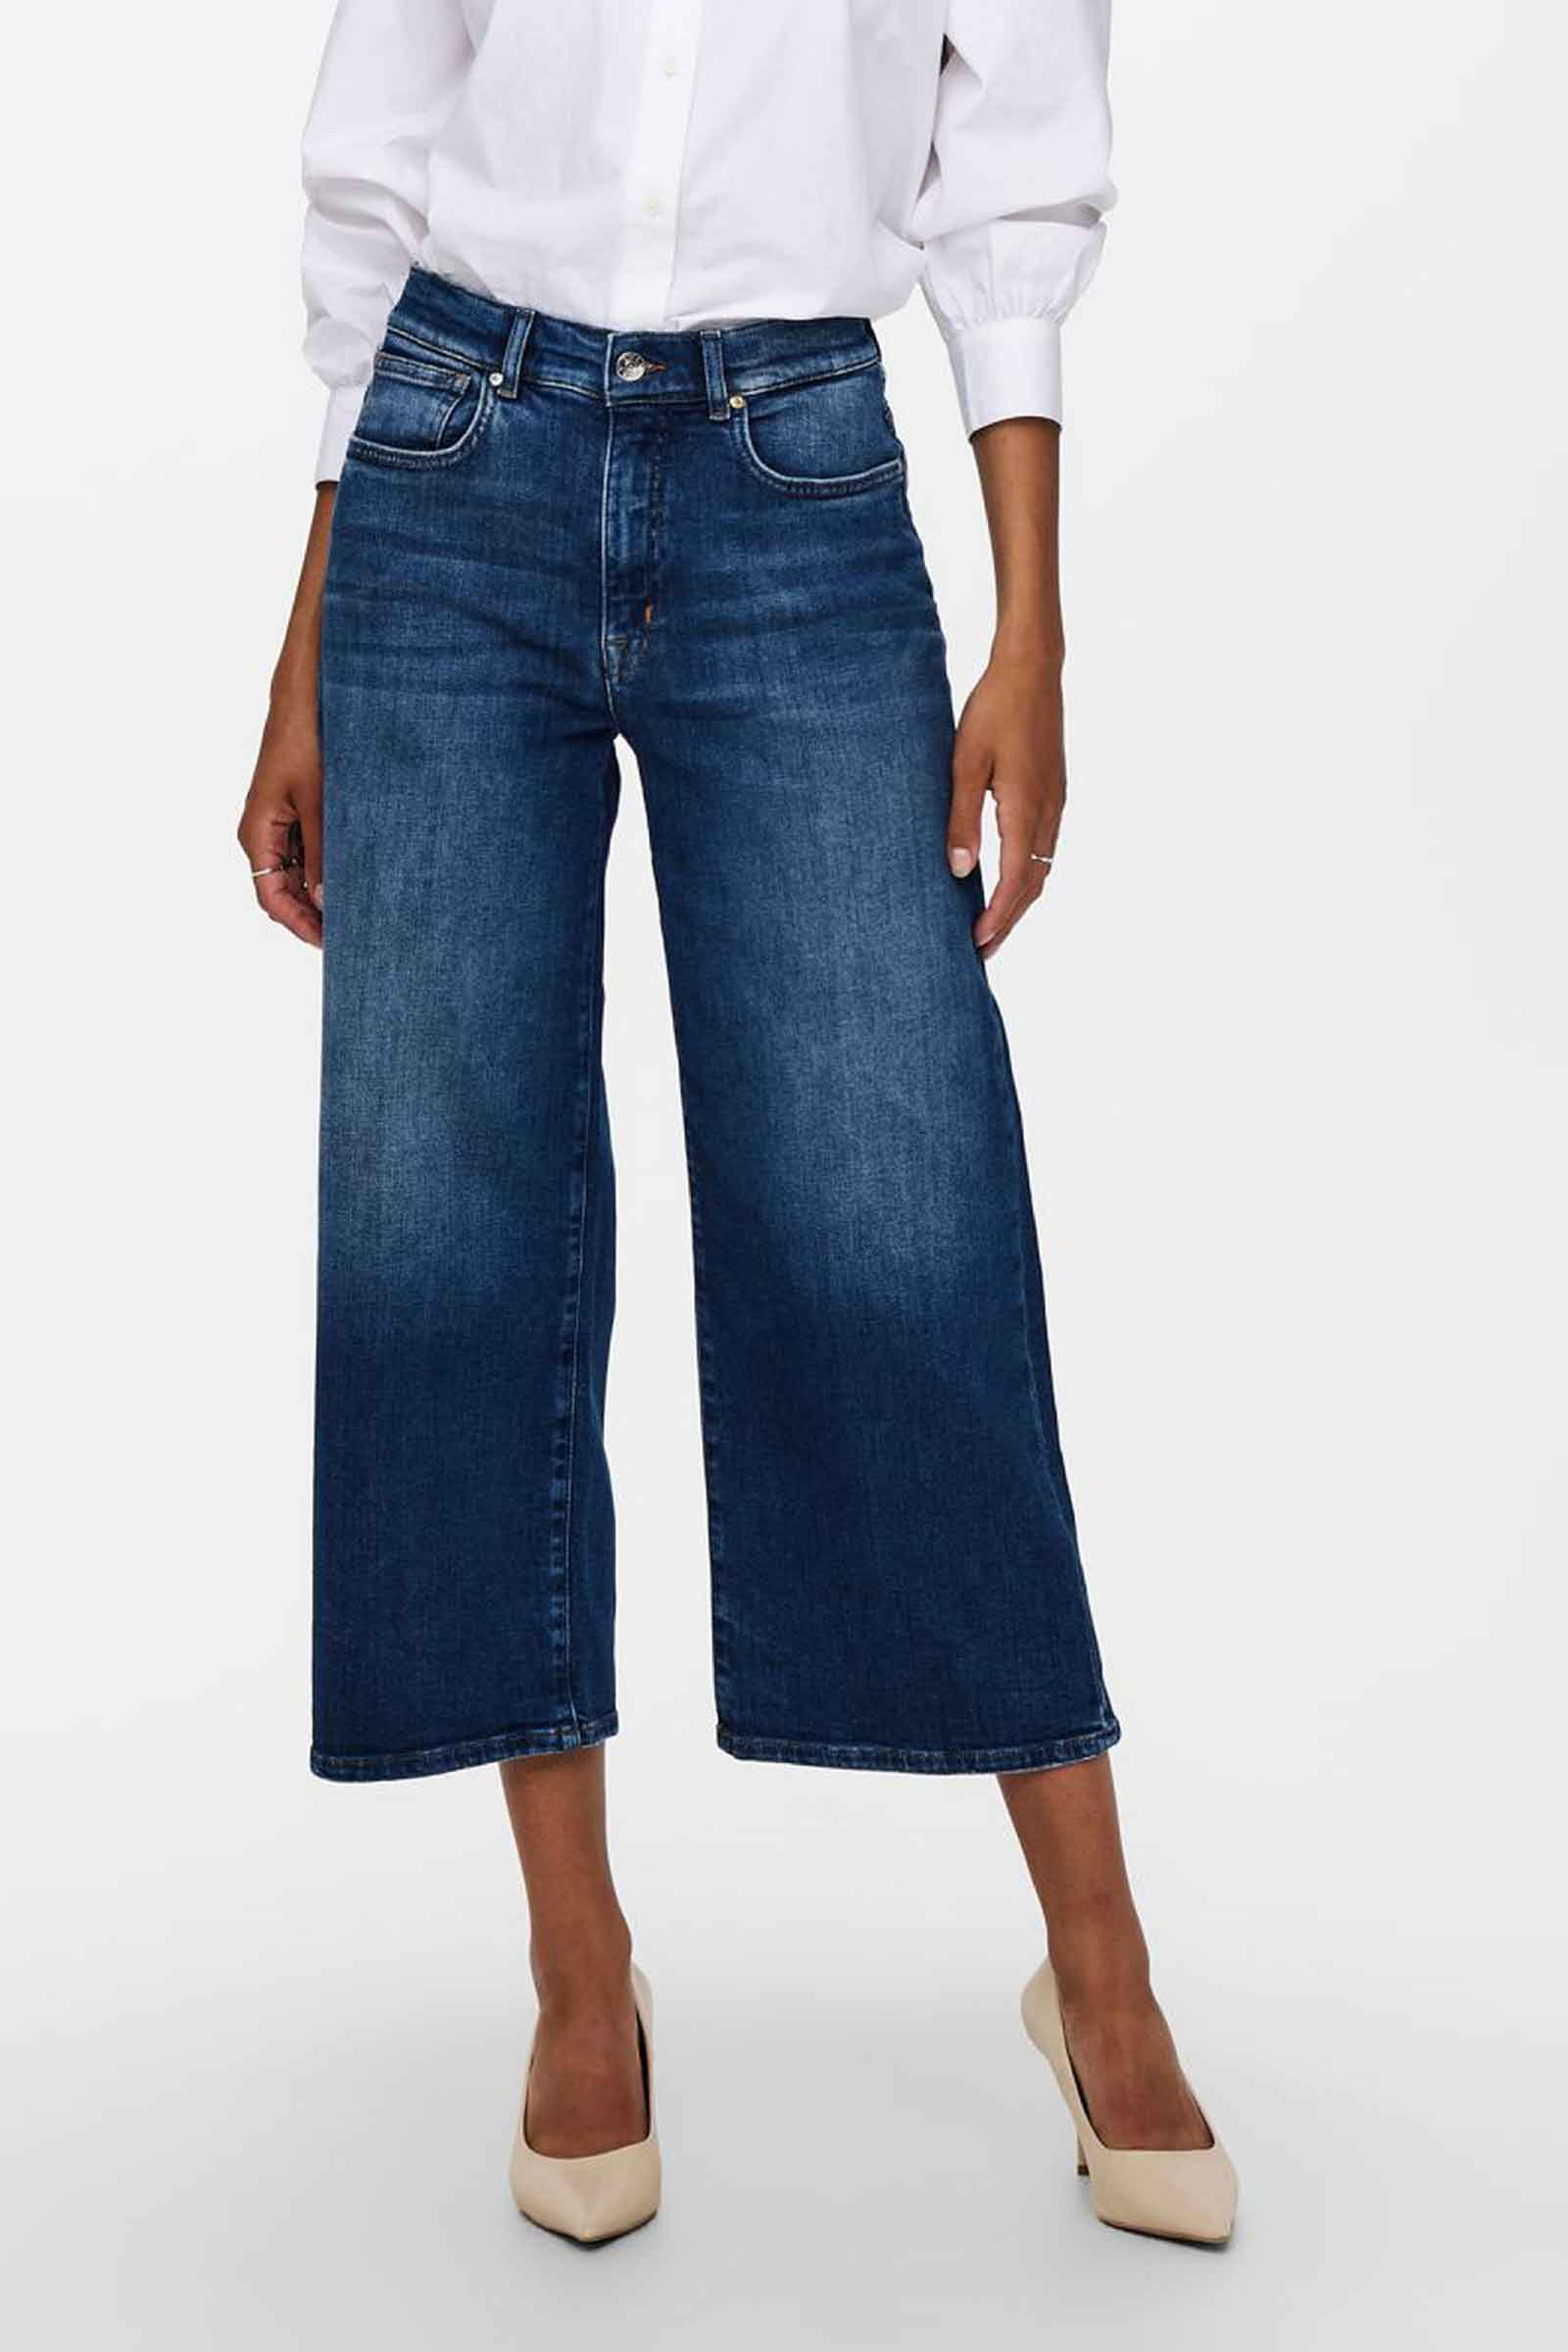 Jeans Woman Model MADISON ONLY   Jeans   15212644Dark Blue Denim